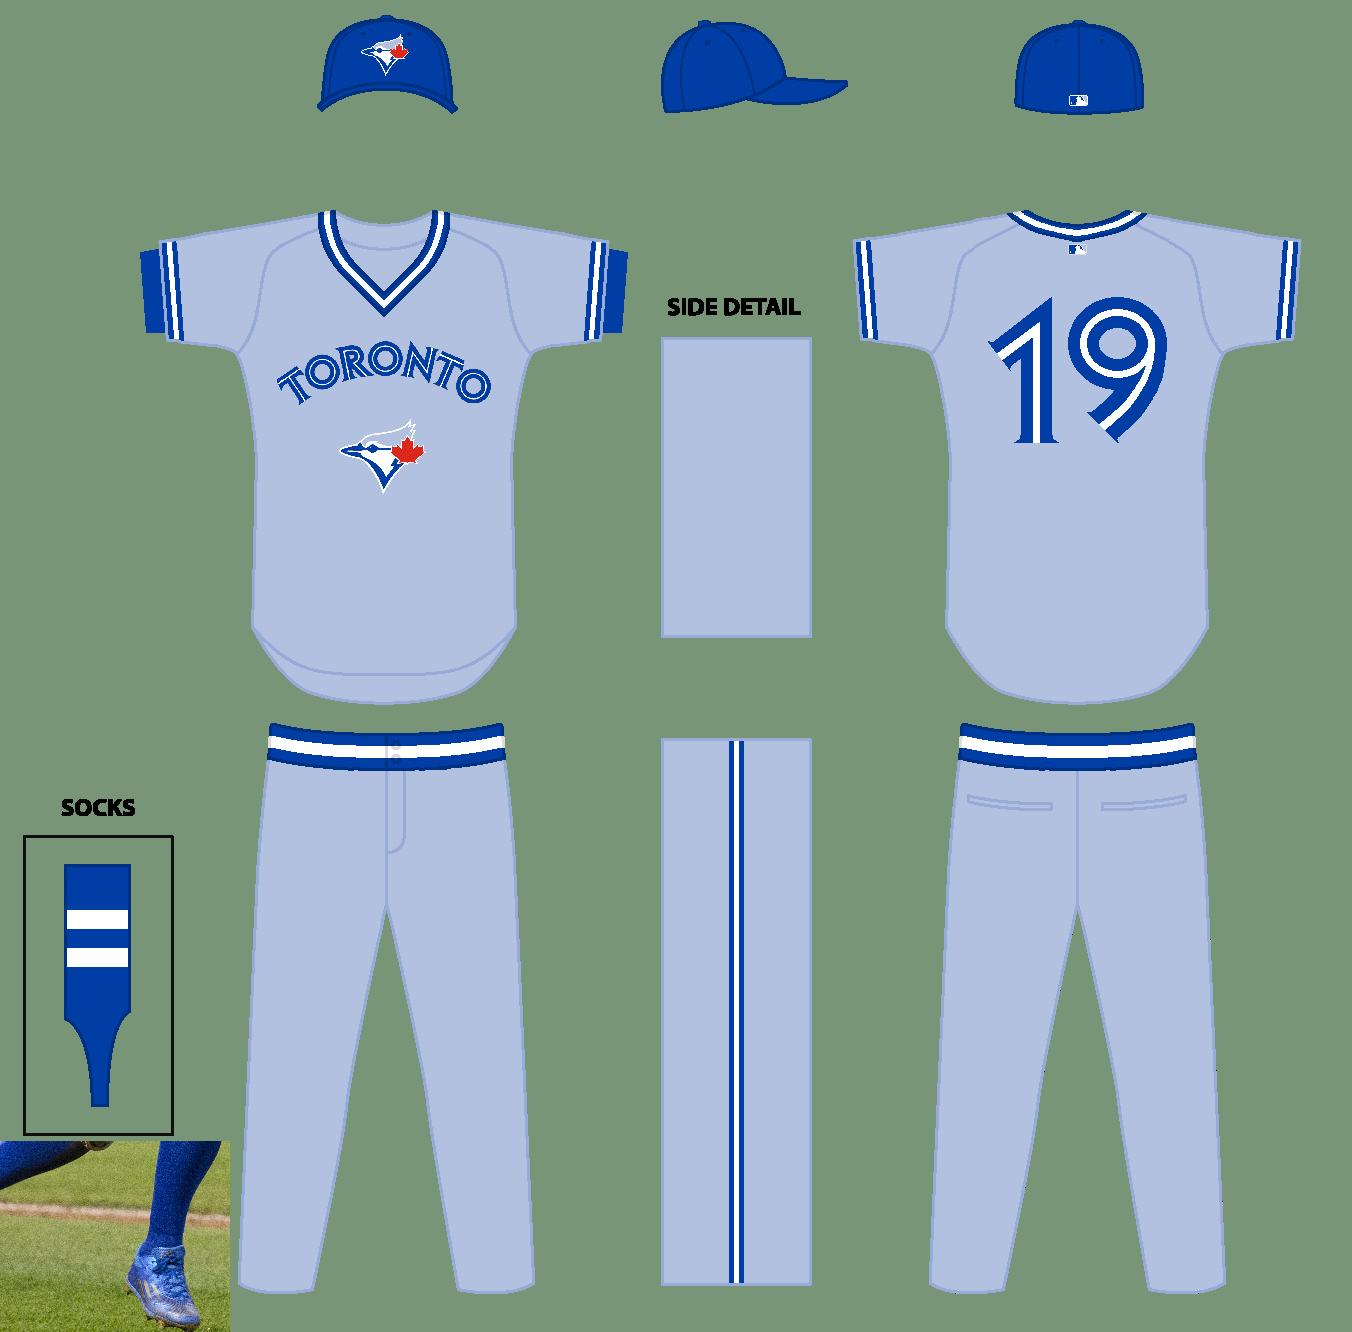 hot sales d596a 94840 The Ultimate Baseball Look: Toronto Blue Jays Road Uniform ...